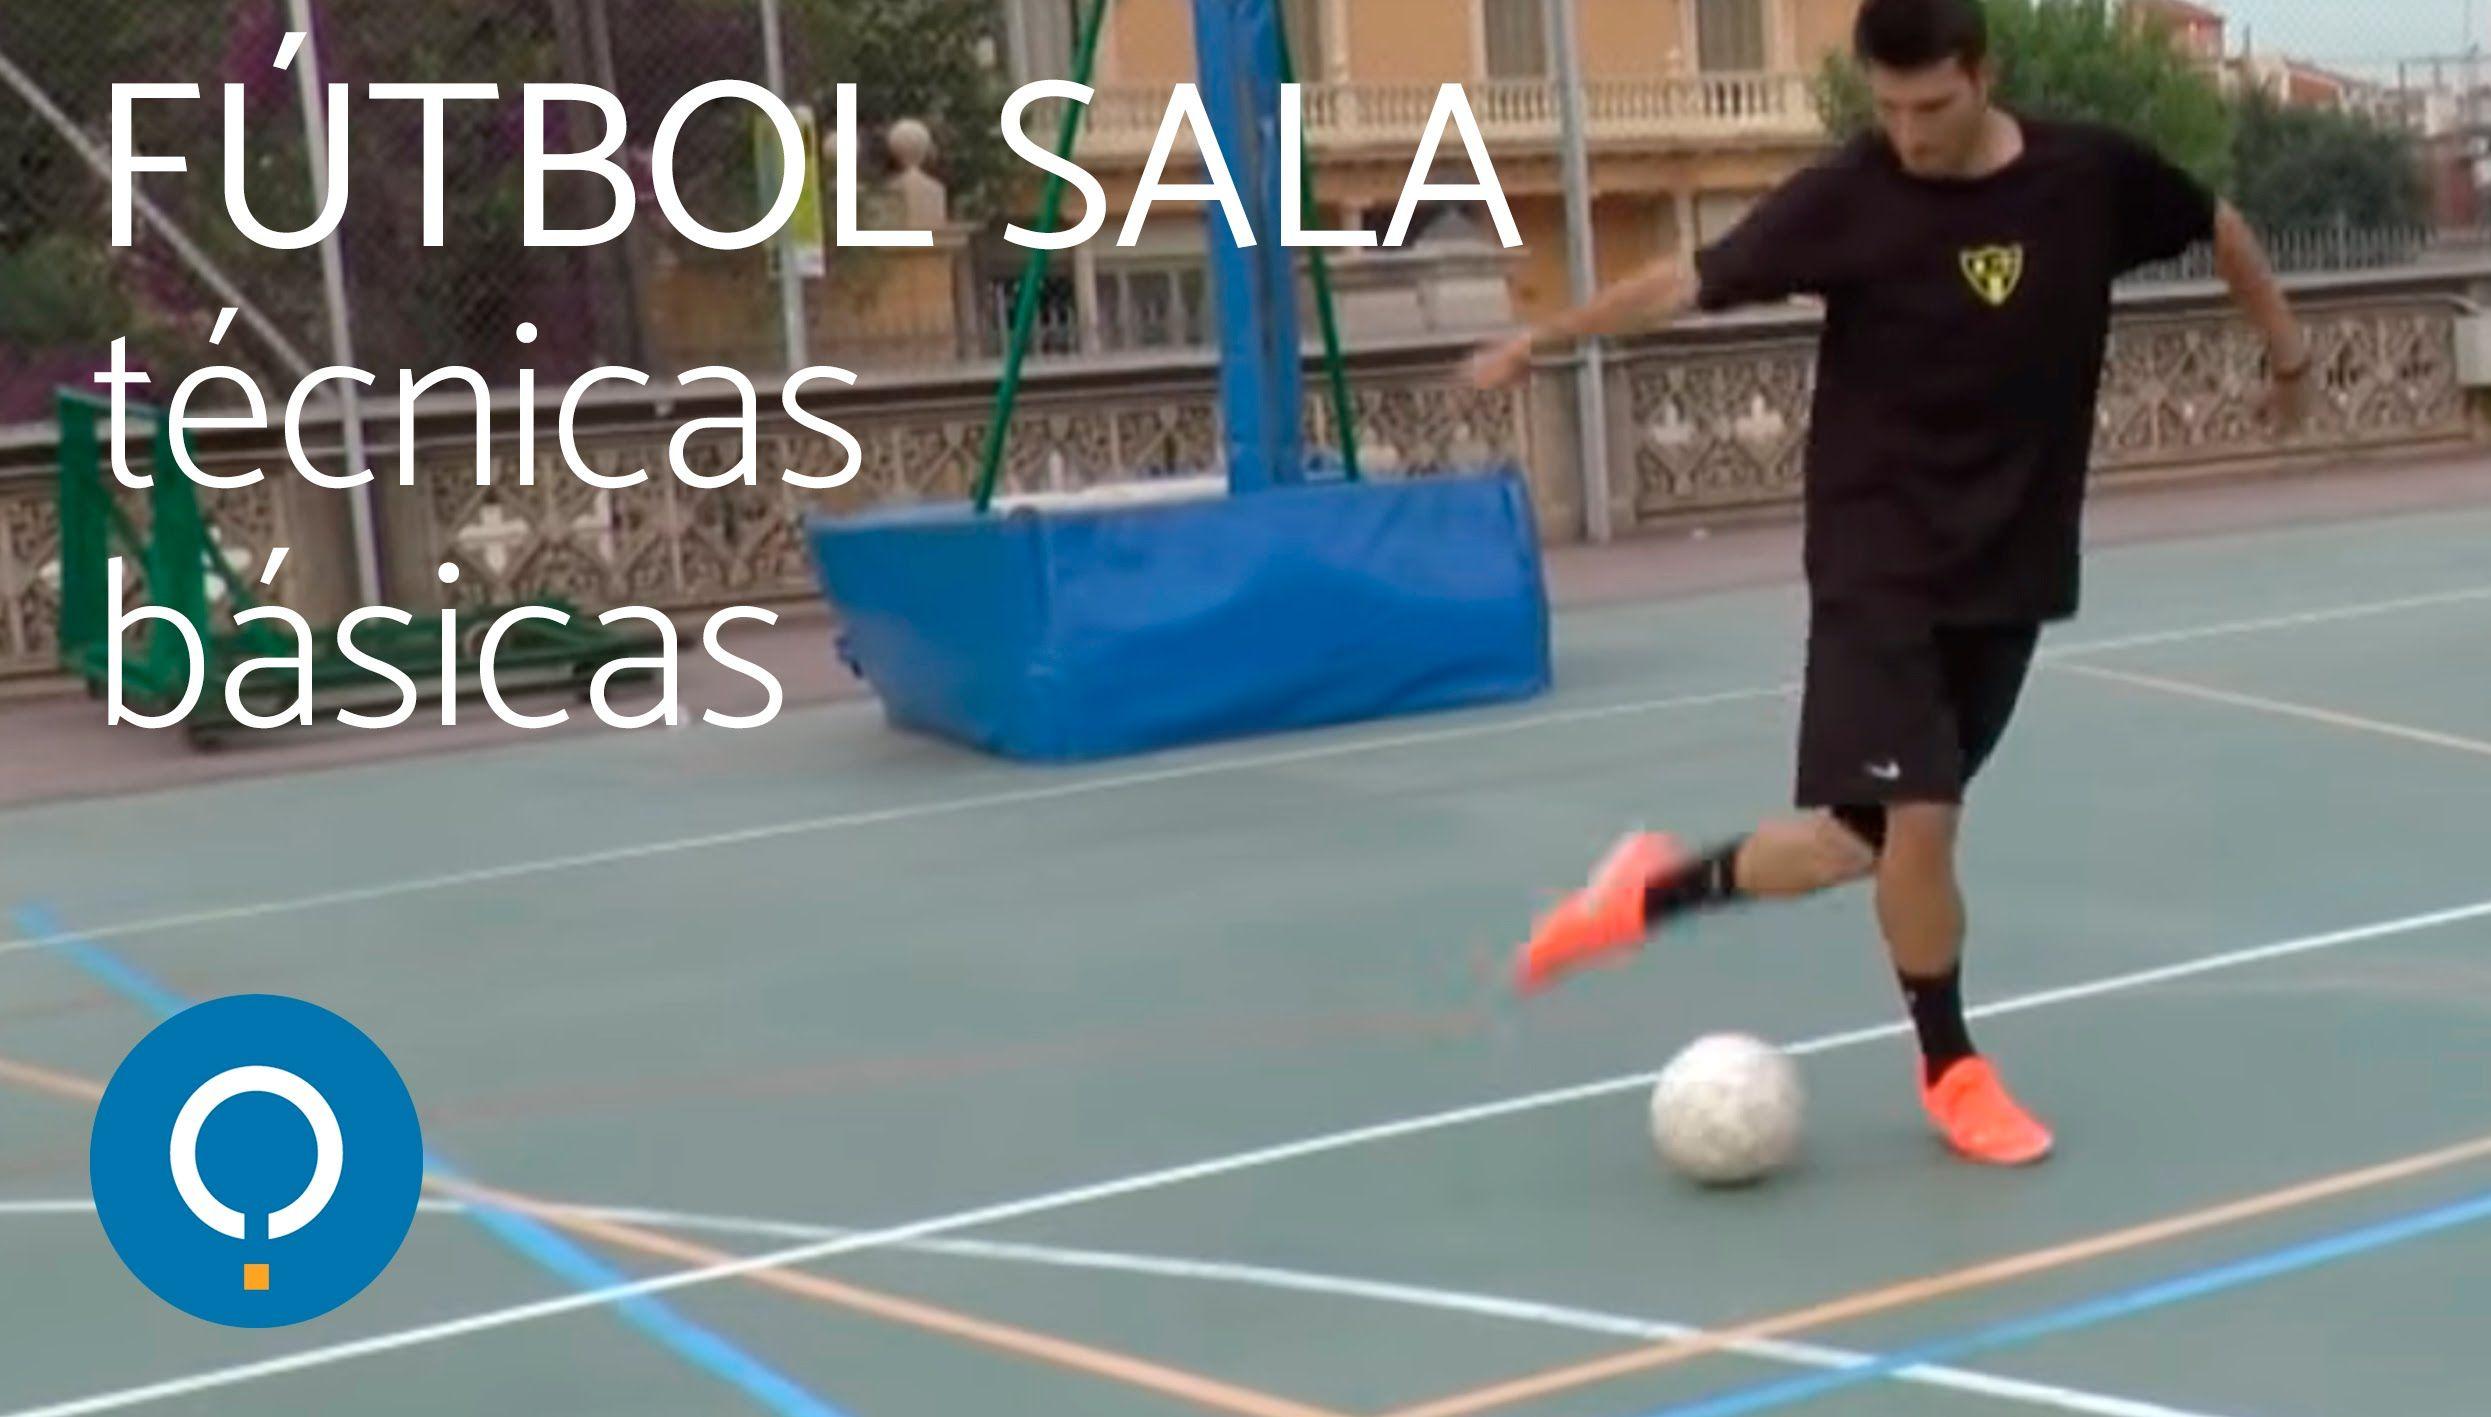 Fútbol sala mejores jugadas y técnicas - Clase de fútbol sala completa d984473742e9a